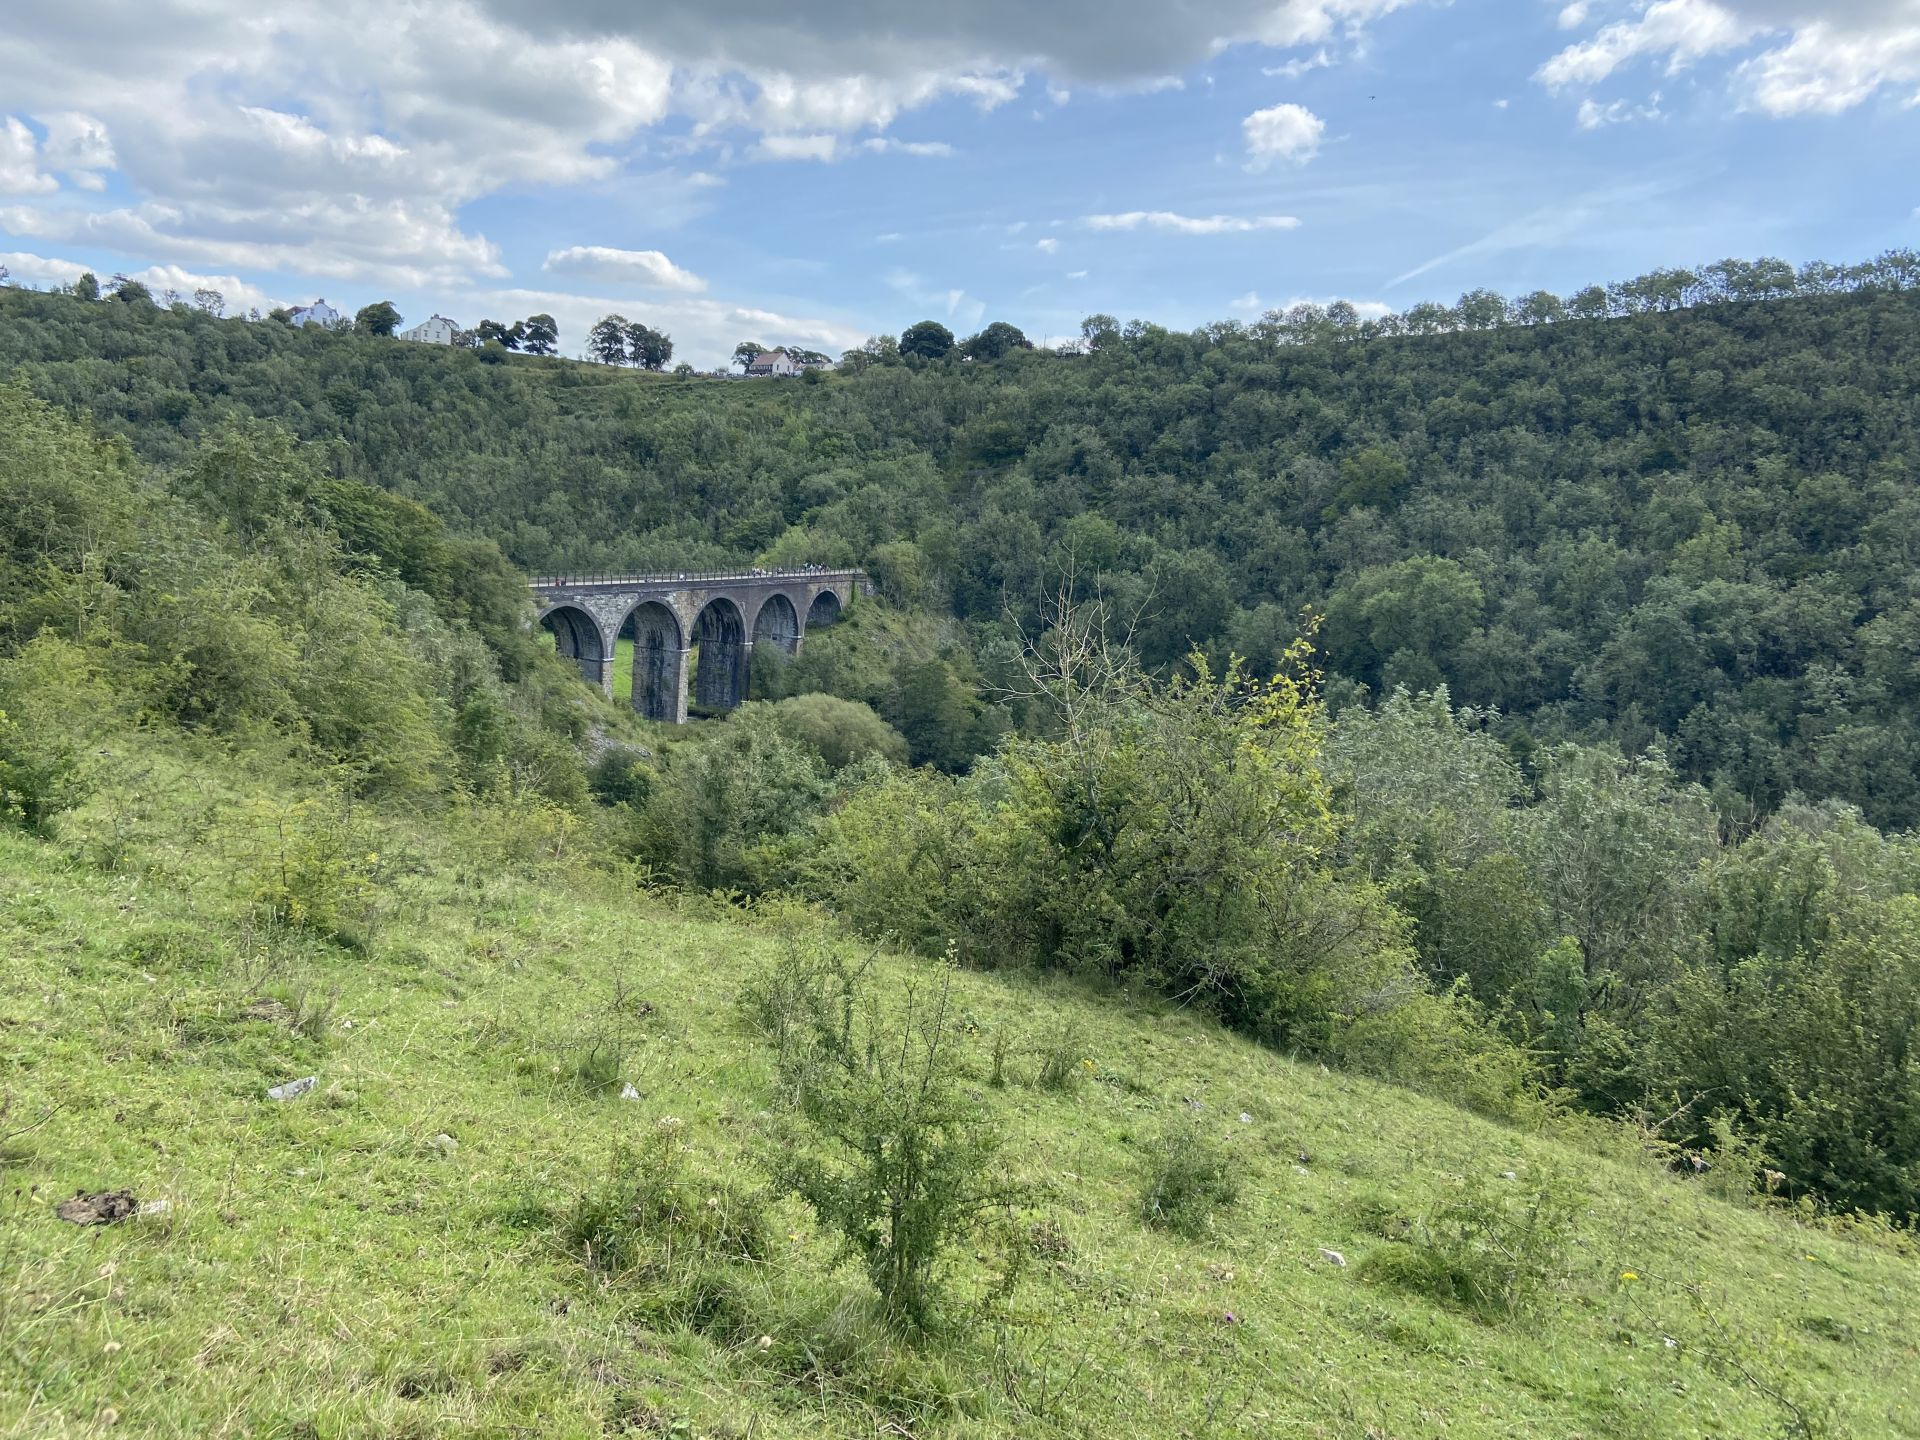 monsal viaduct in the Peak District